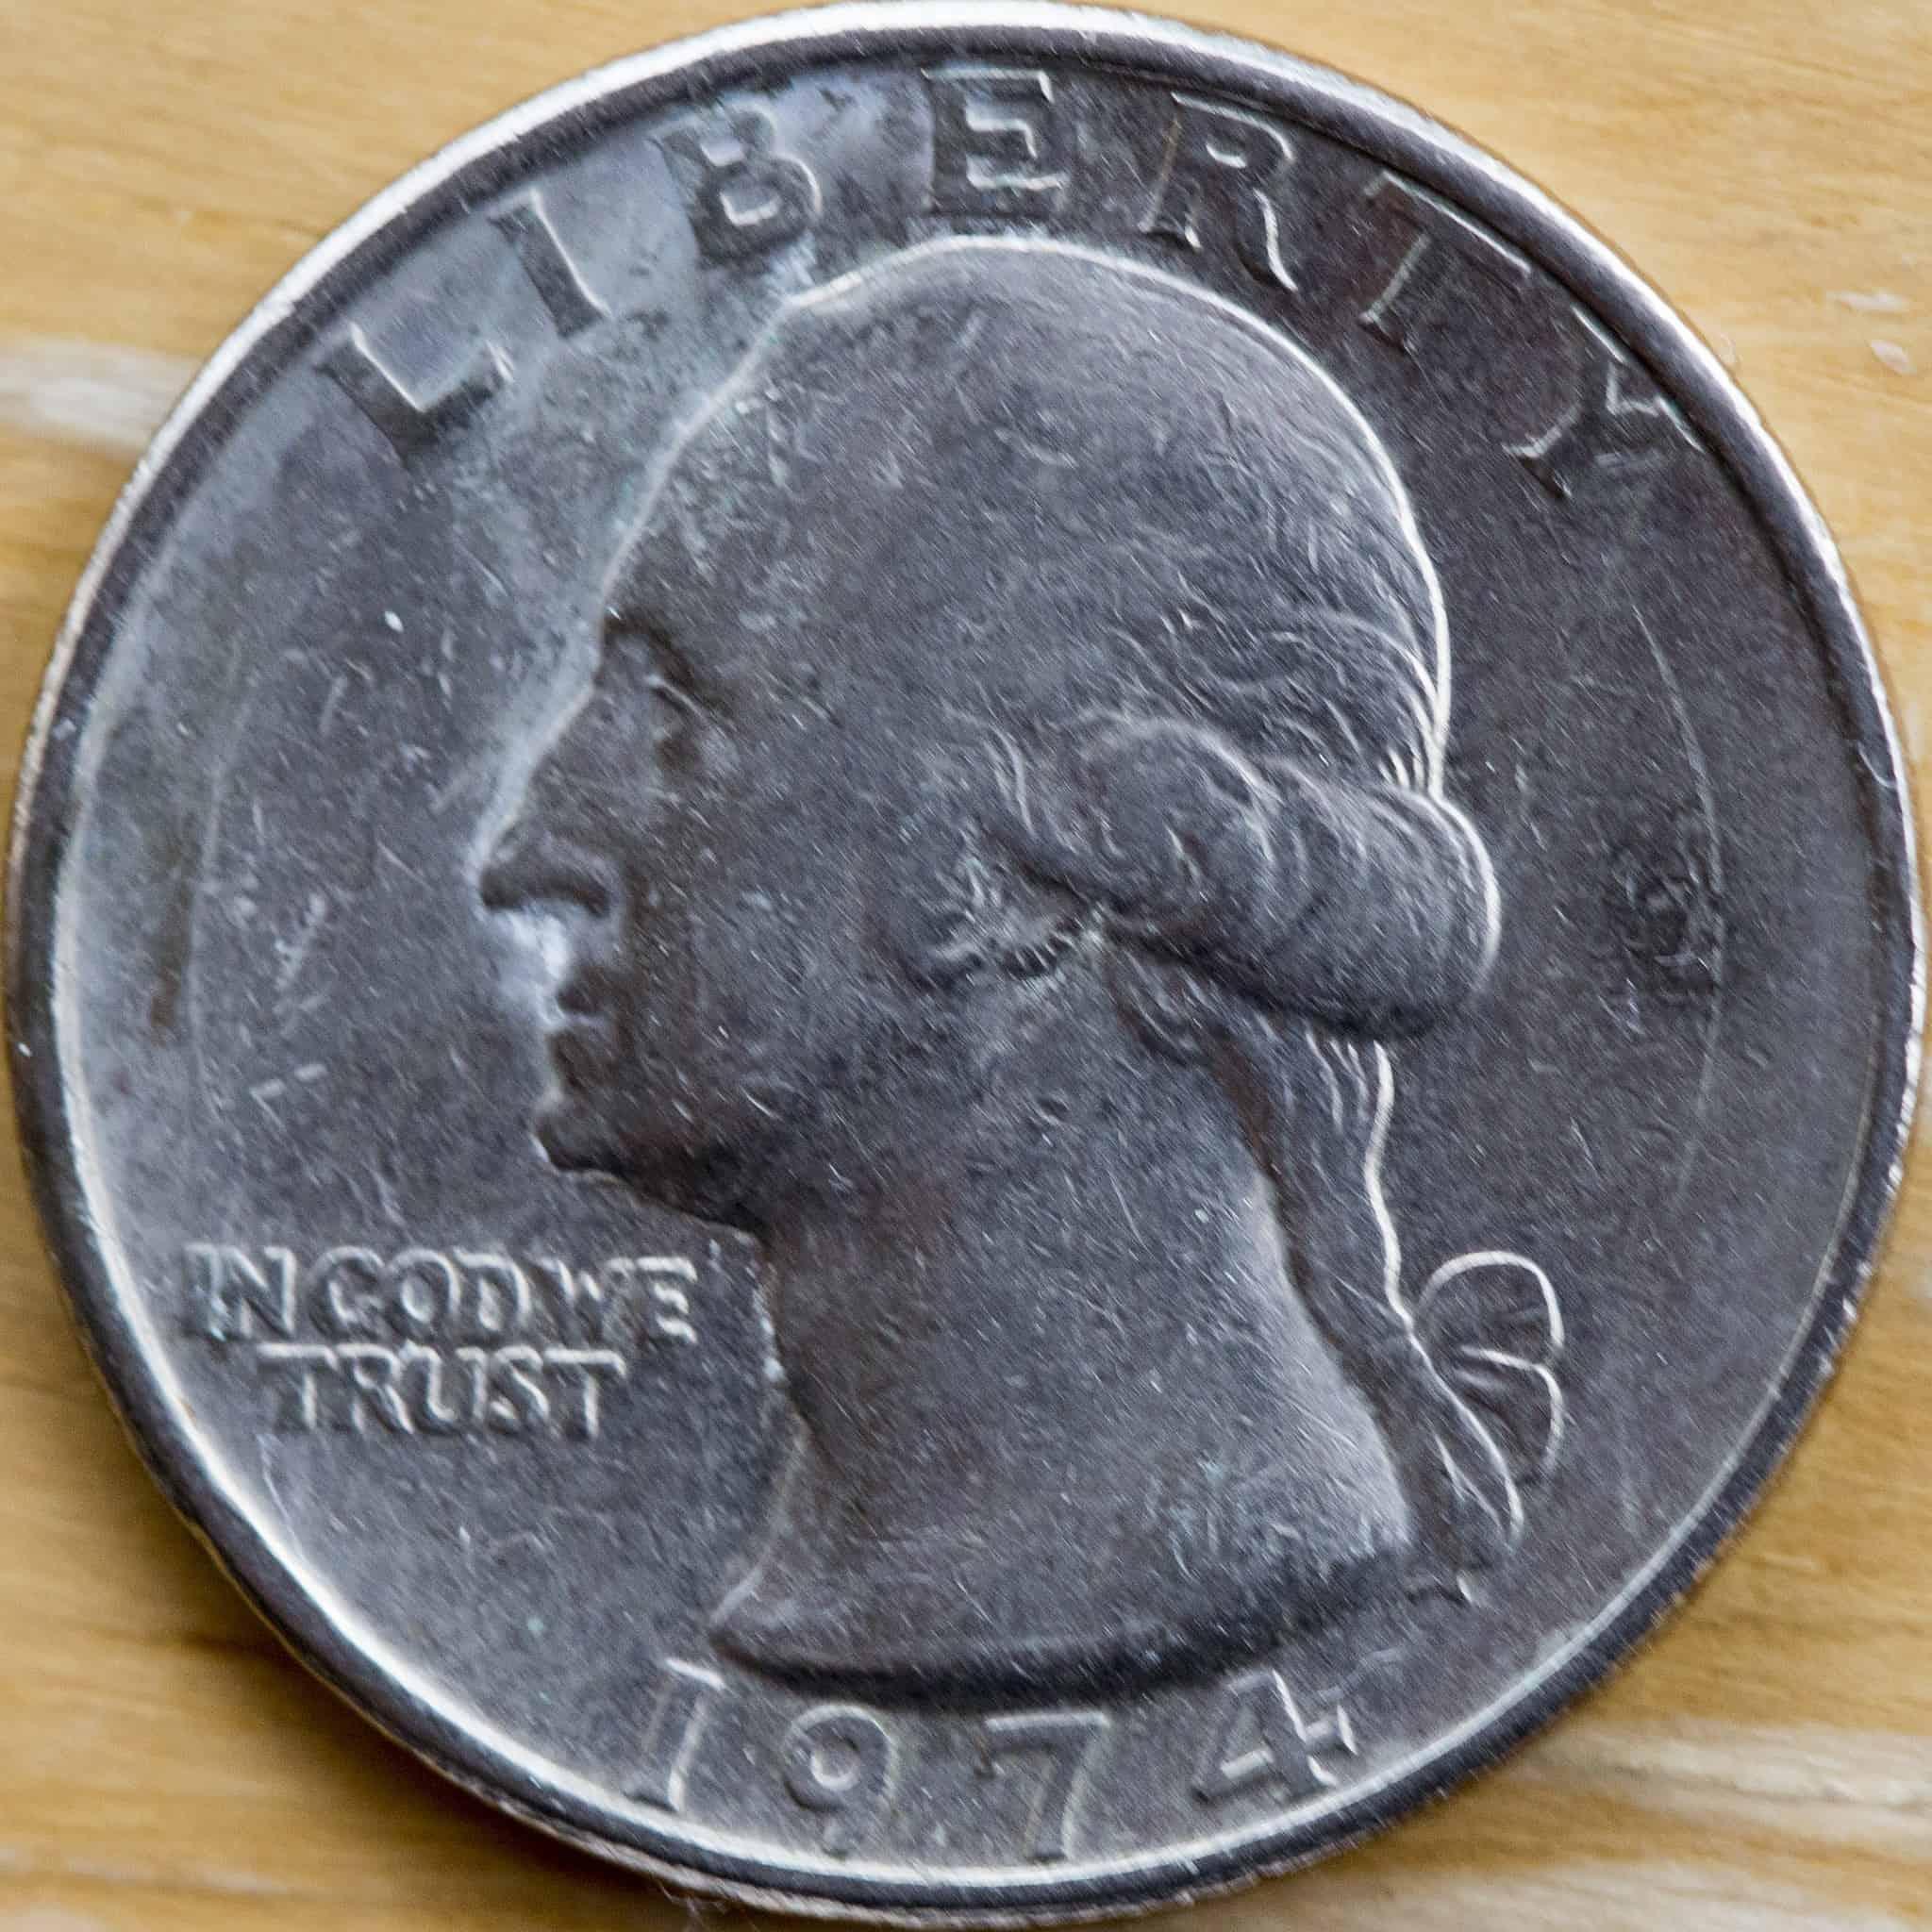 1974 Washington Quarter: A Great Coin To Start A Modern